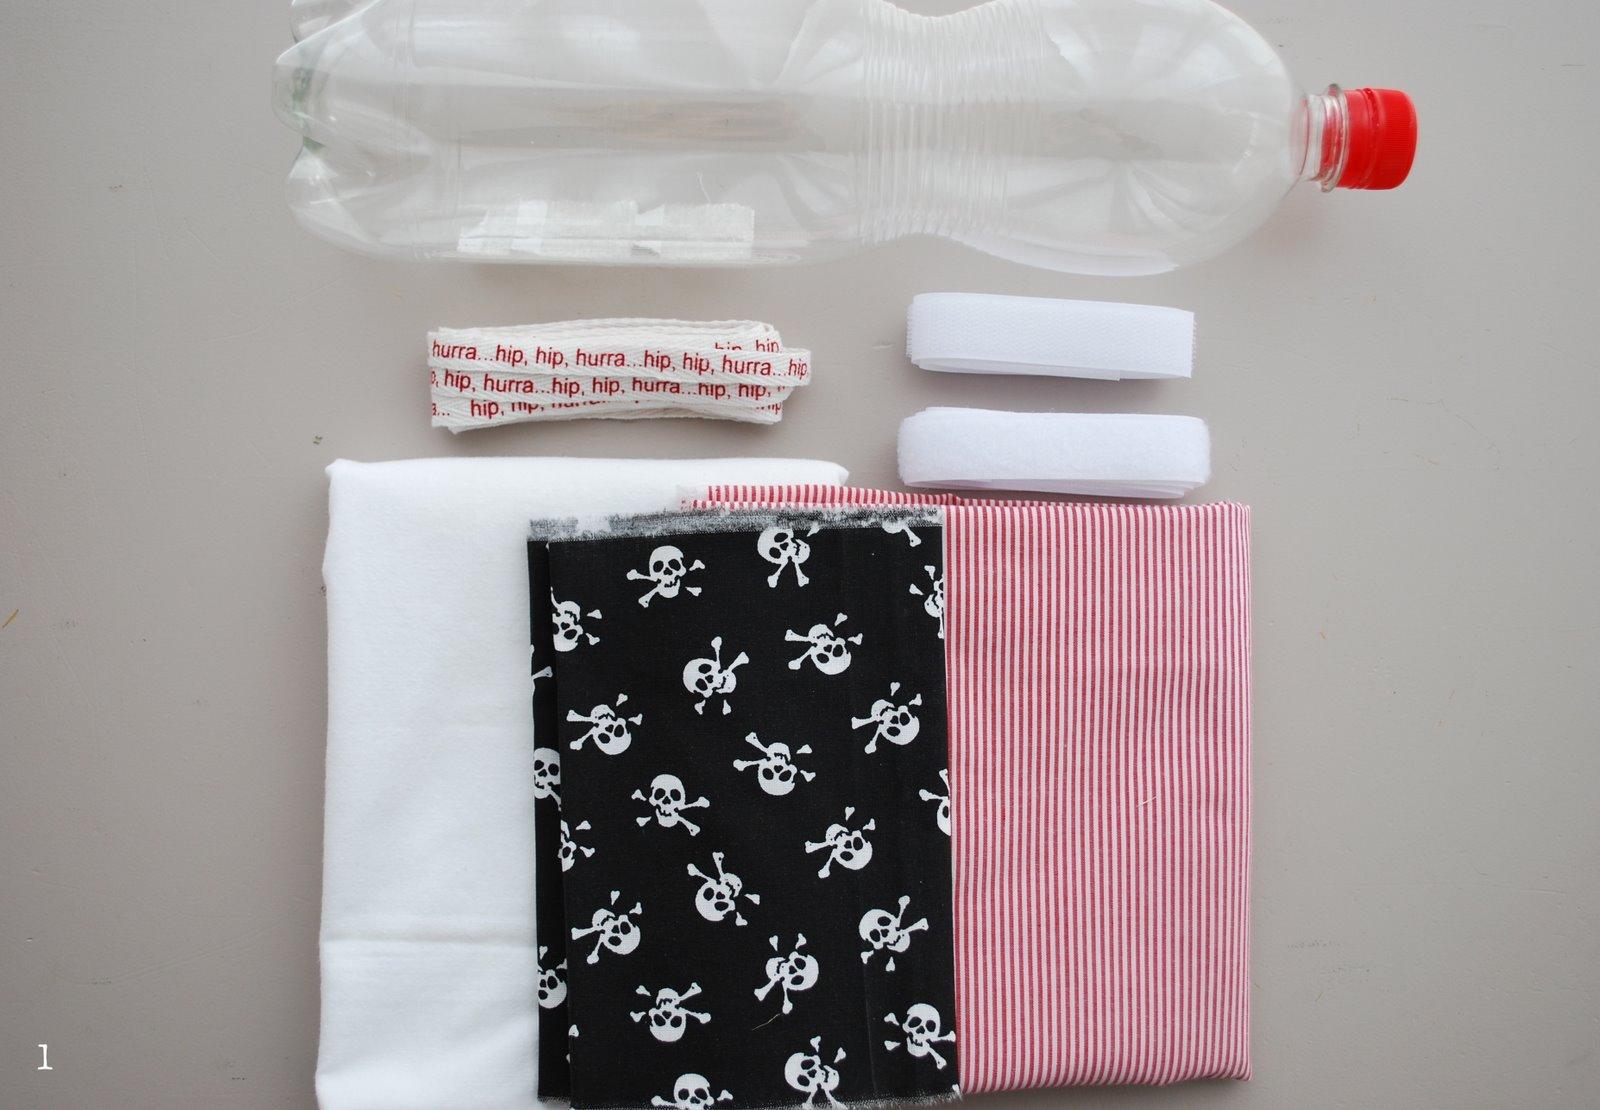 mamas kram anleitung f r knallbonbon aus stoff. Black Bedroom Furniture Sets. Home Design Ideas